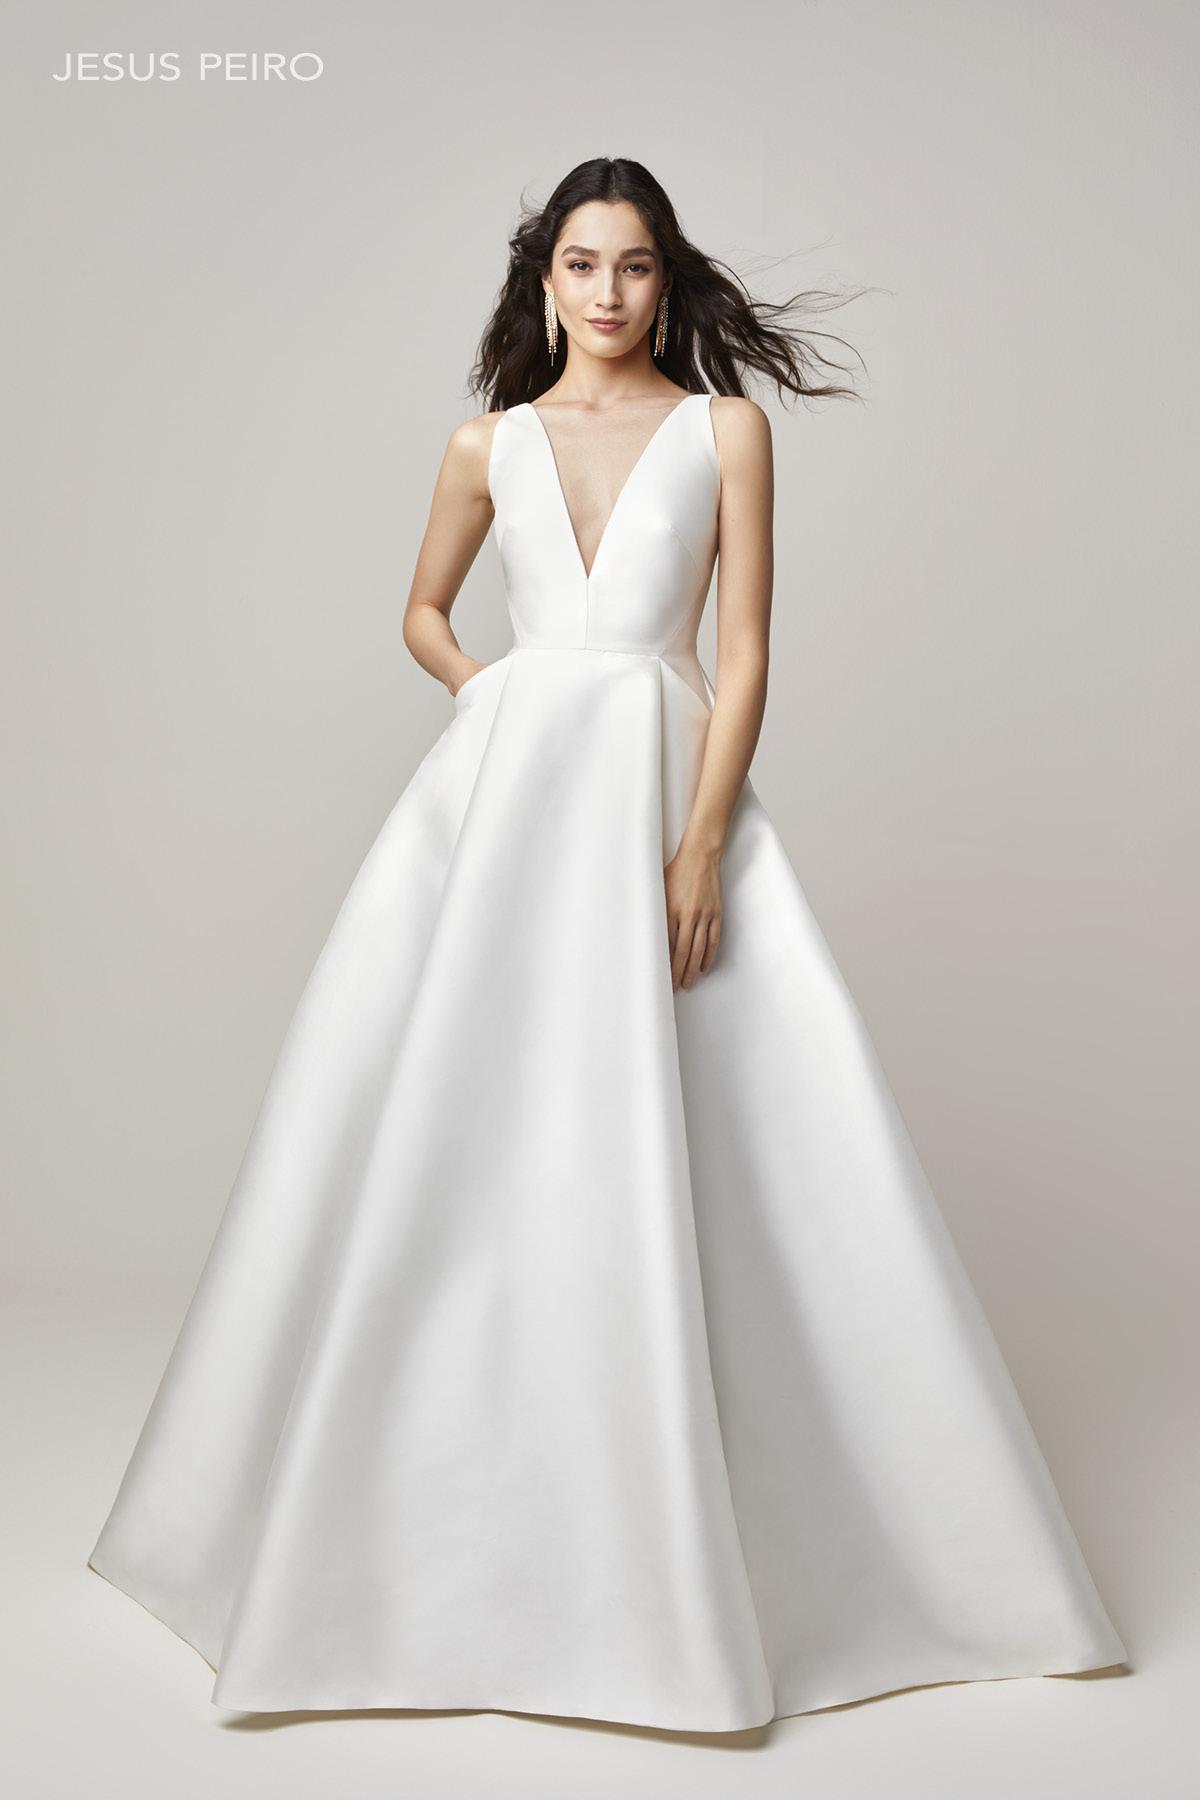 Vestido novia Jesús Peiró Ref.2241